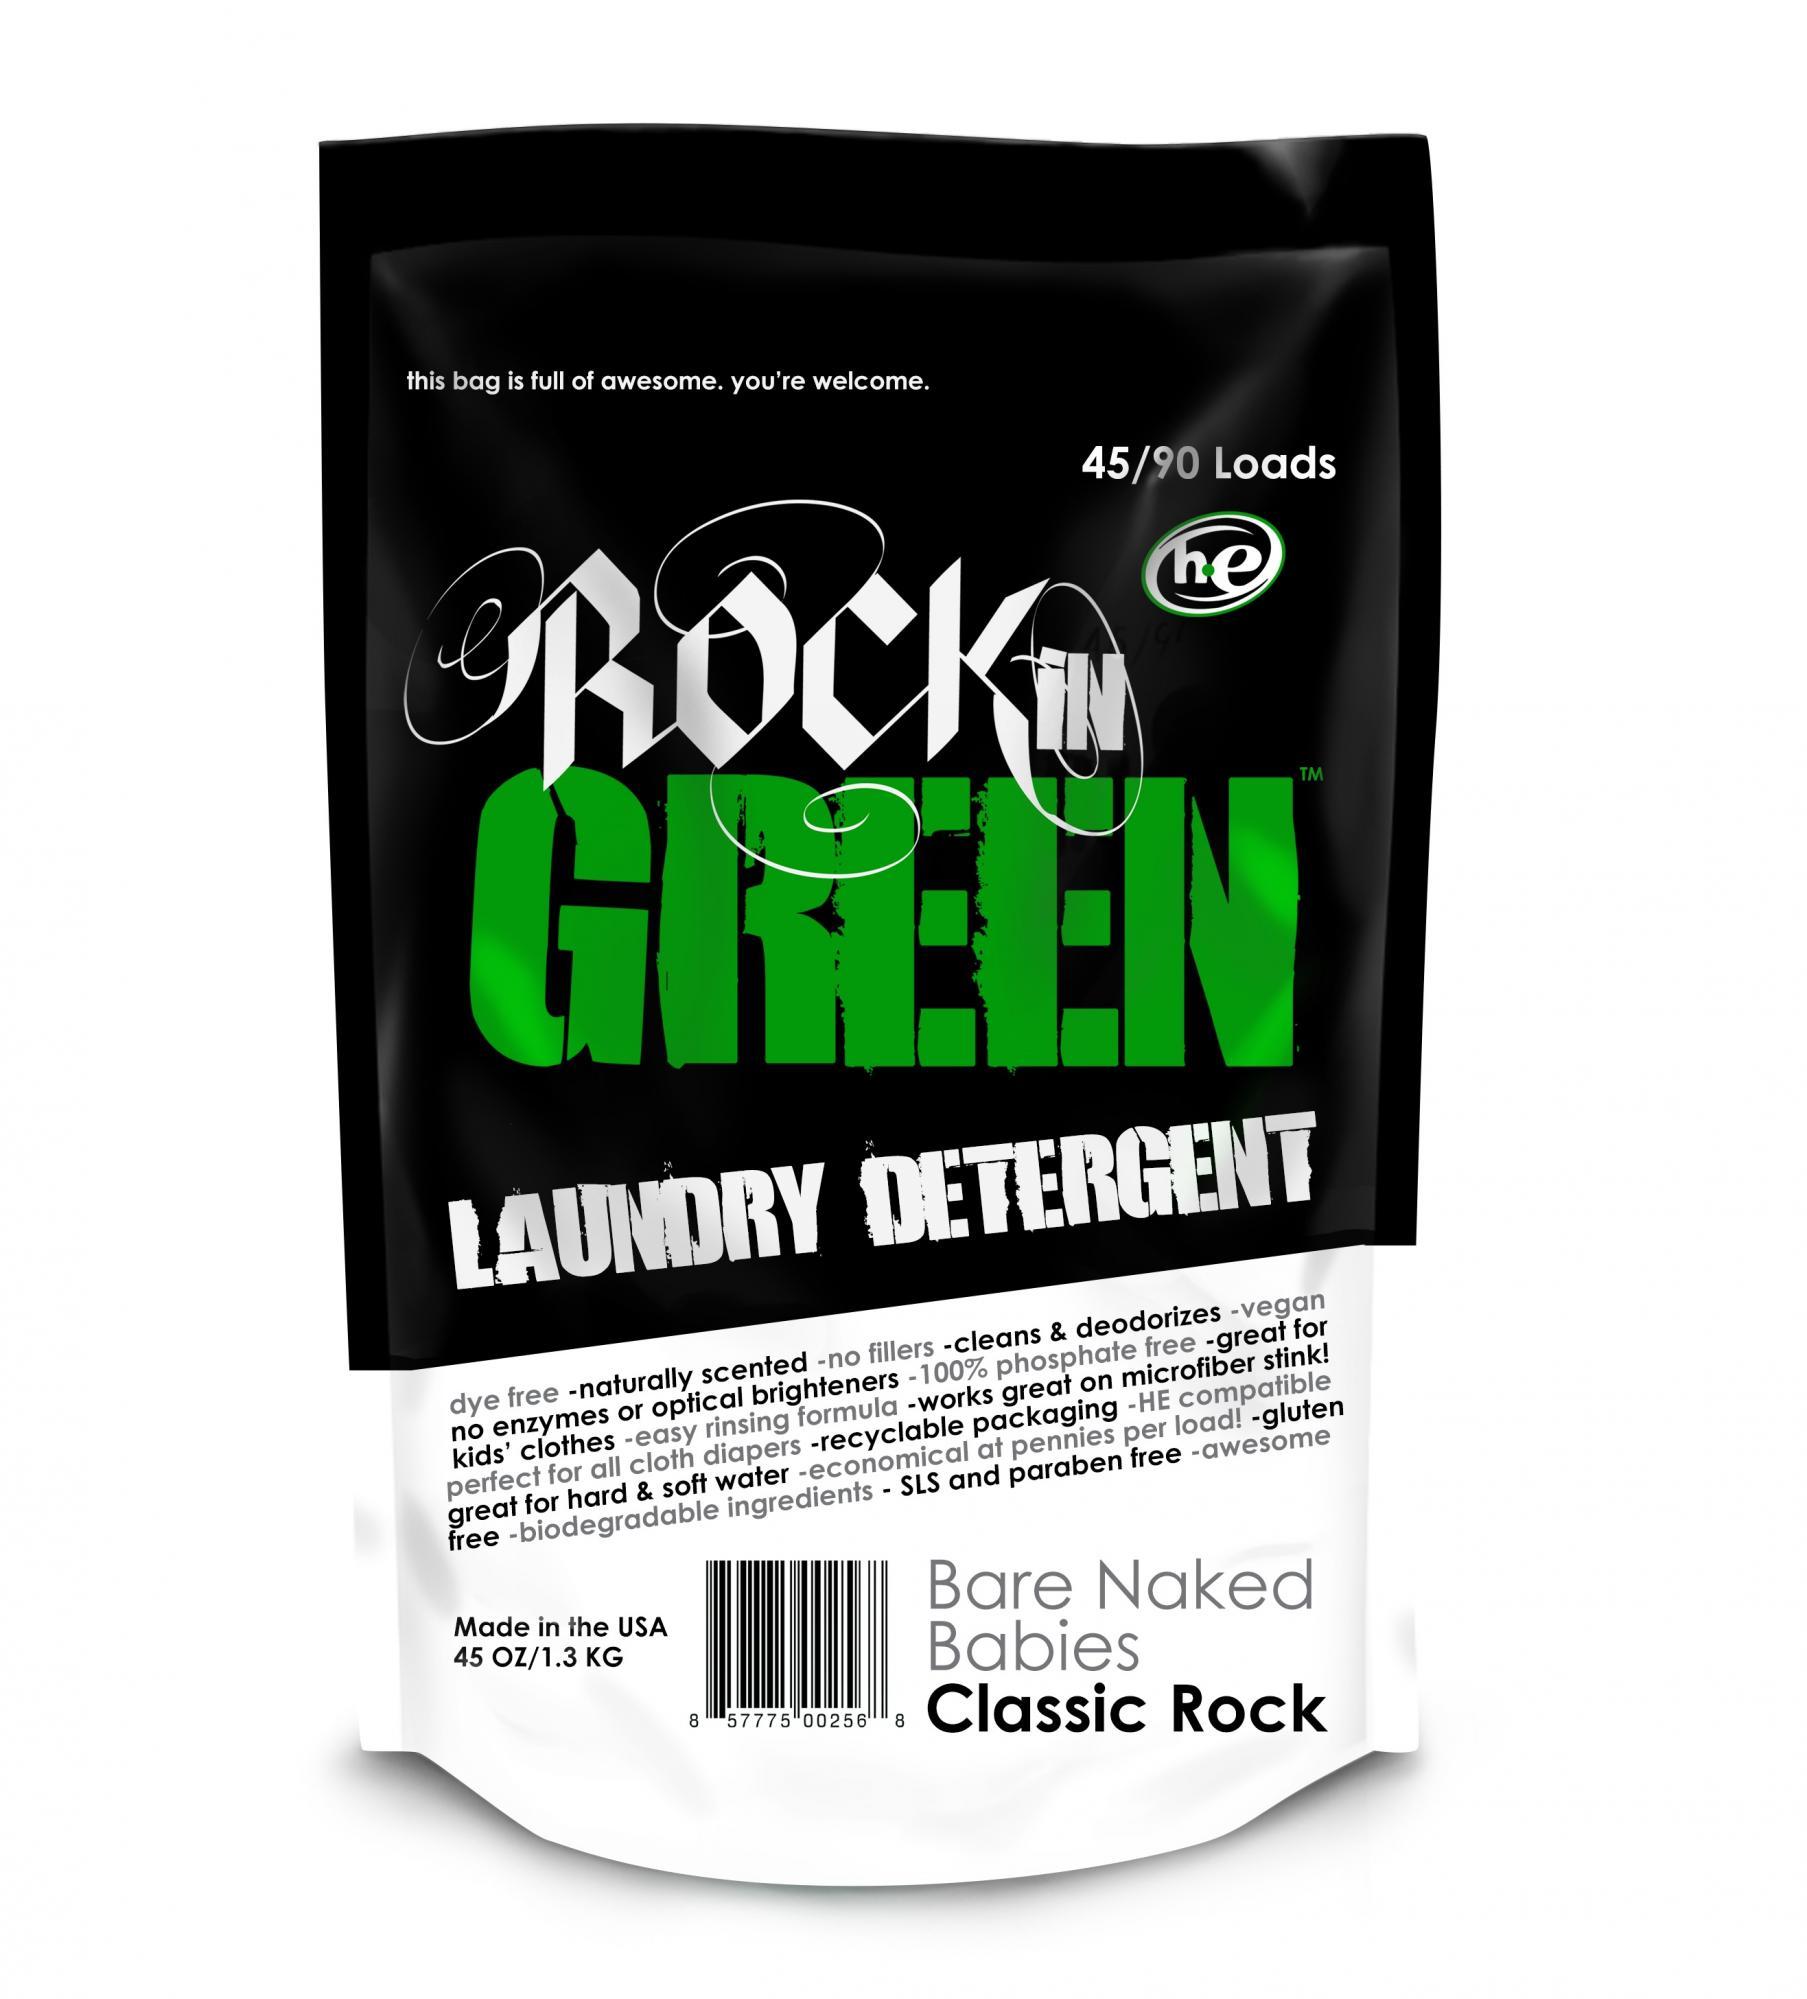 rockin-green-classic-rock-bare-naked-babies.jpg